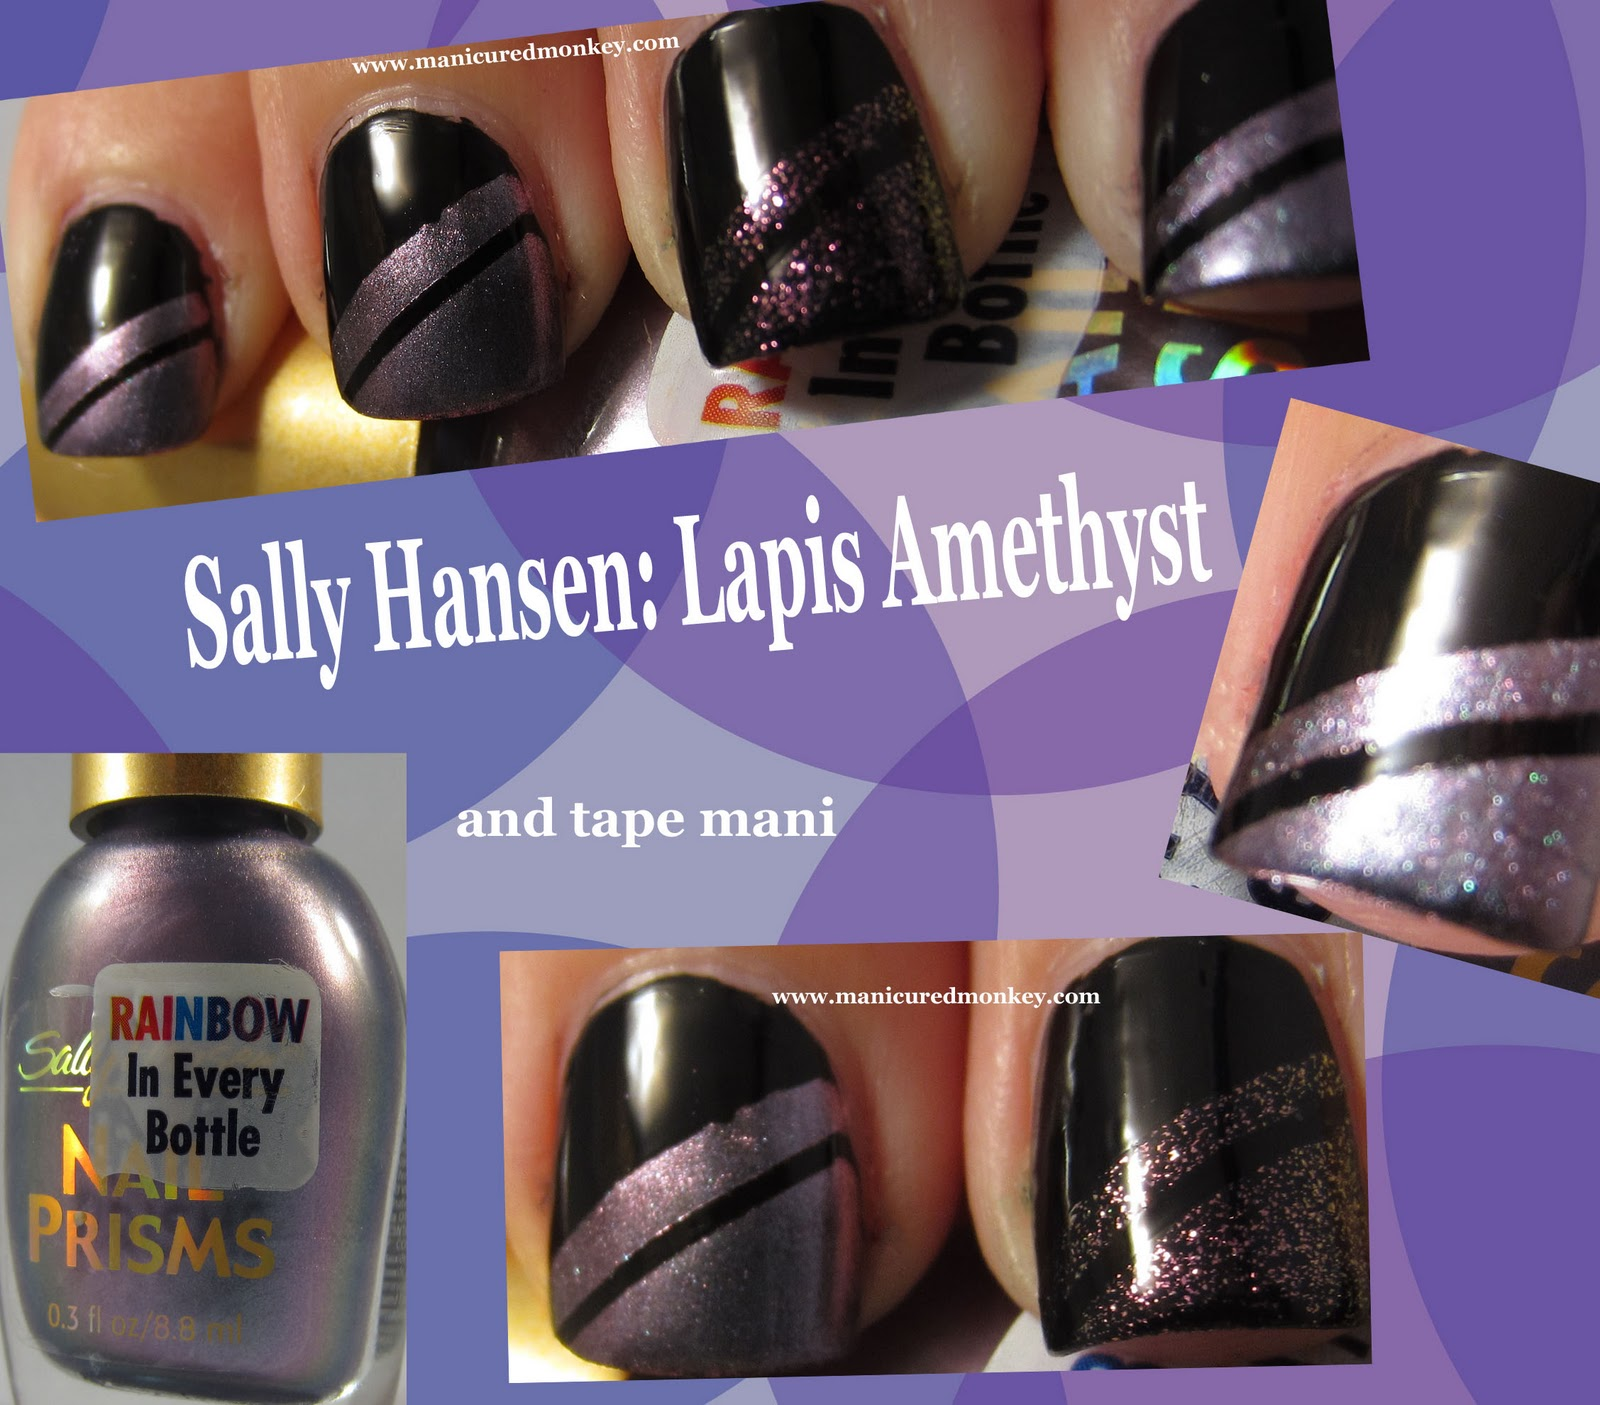 The Manicured Monkey Sally Hansen Lapis Amethyst